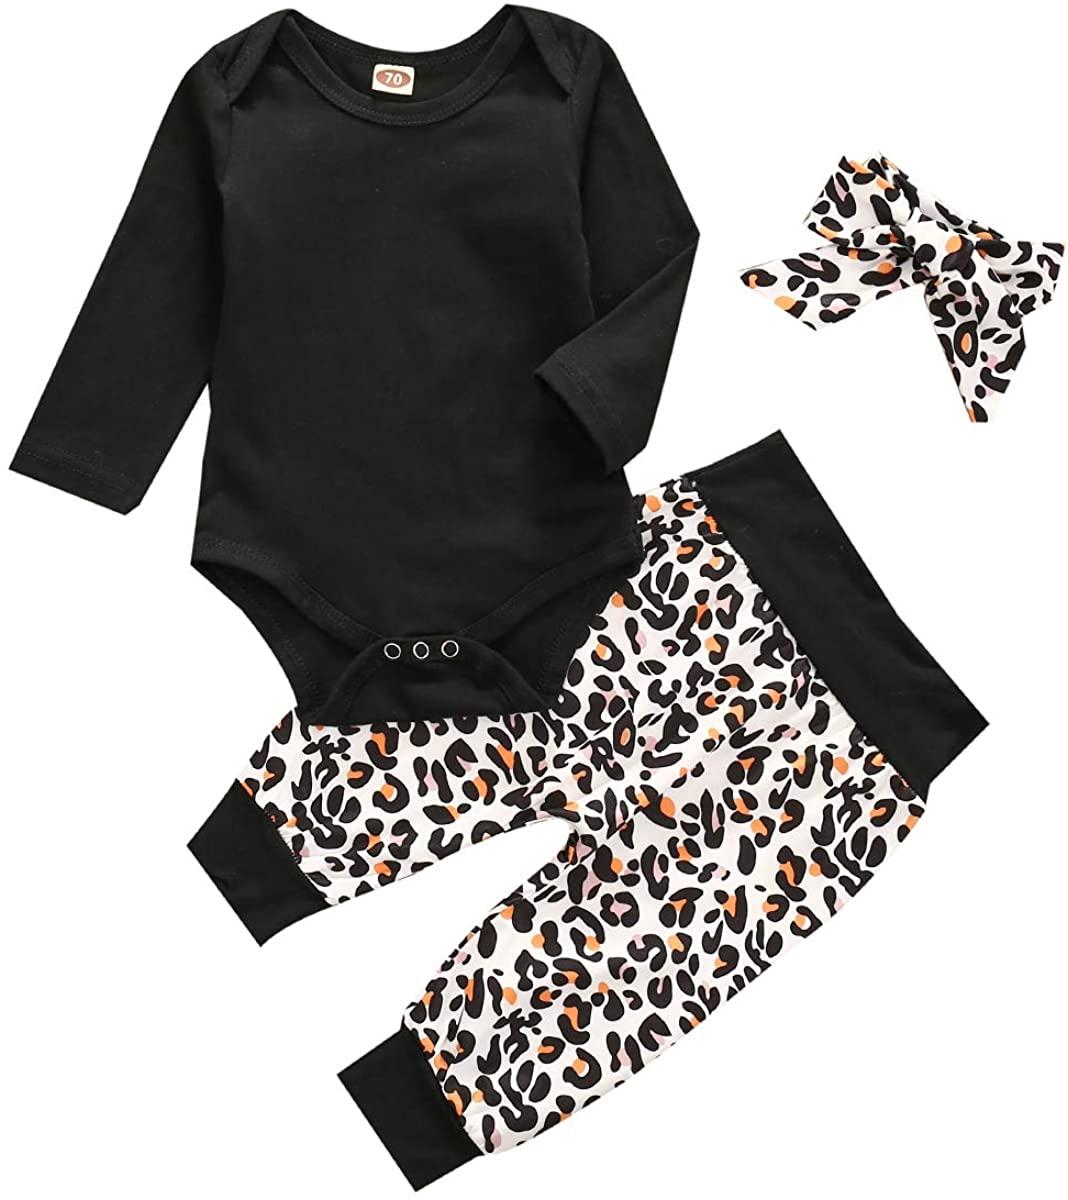 Aixin 3PCS Infant Baby Girls Clothes Long Sleeve Romper Bodysuit Leopard Long Pants Headband Outfits 0-24M